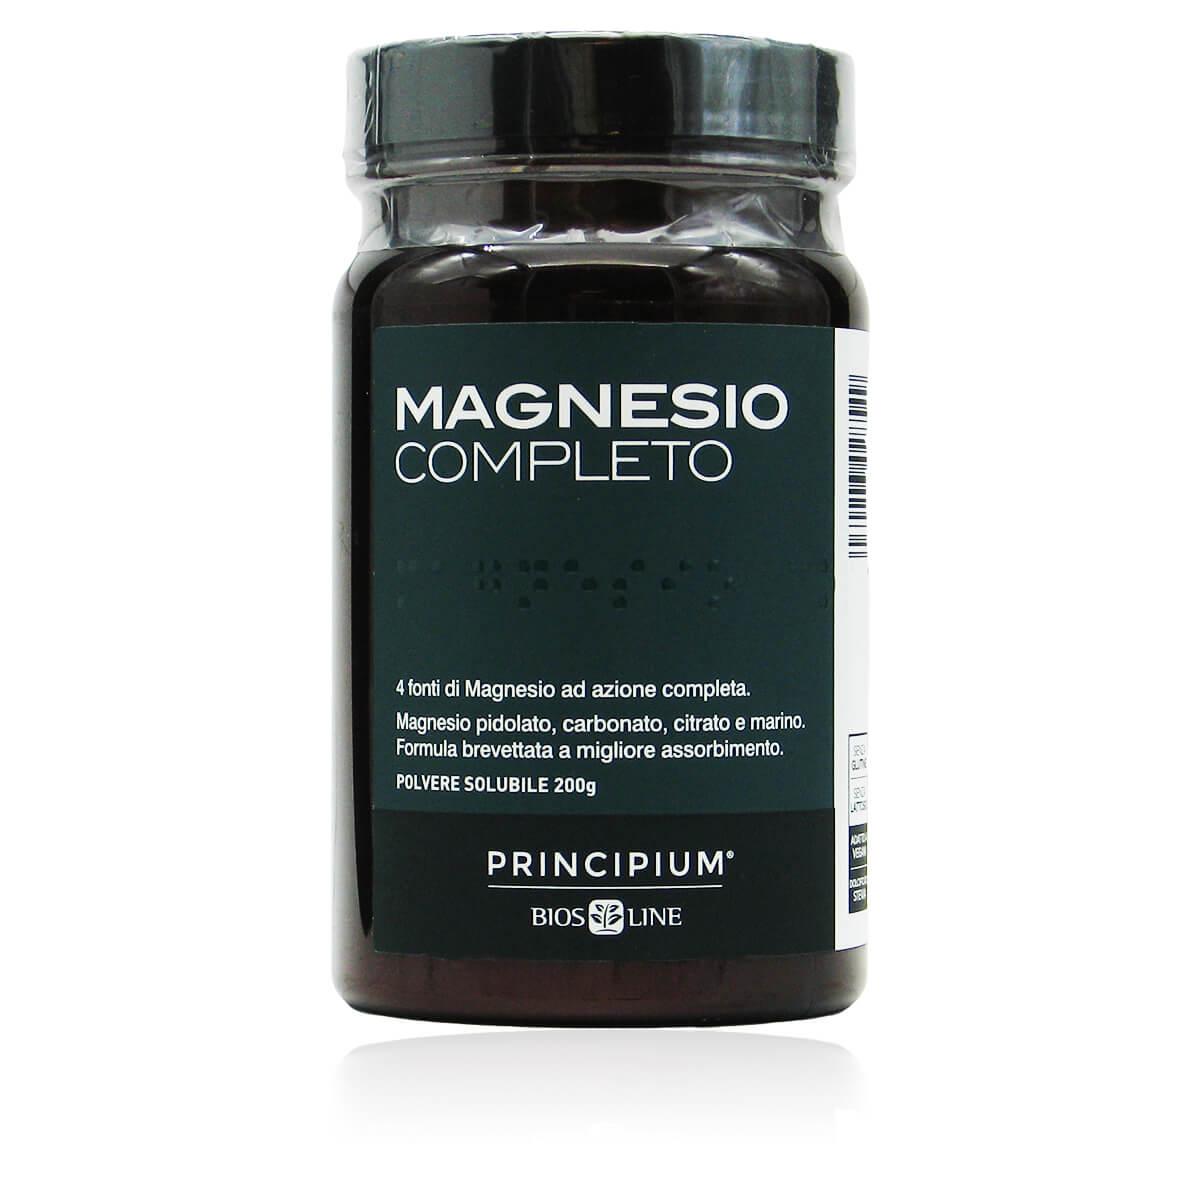 Bios Line Principium Magnesio Completo Polvere Solubile